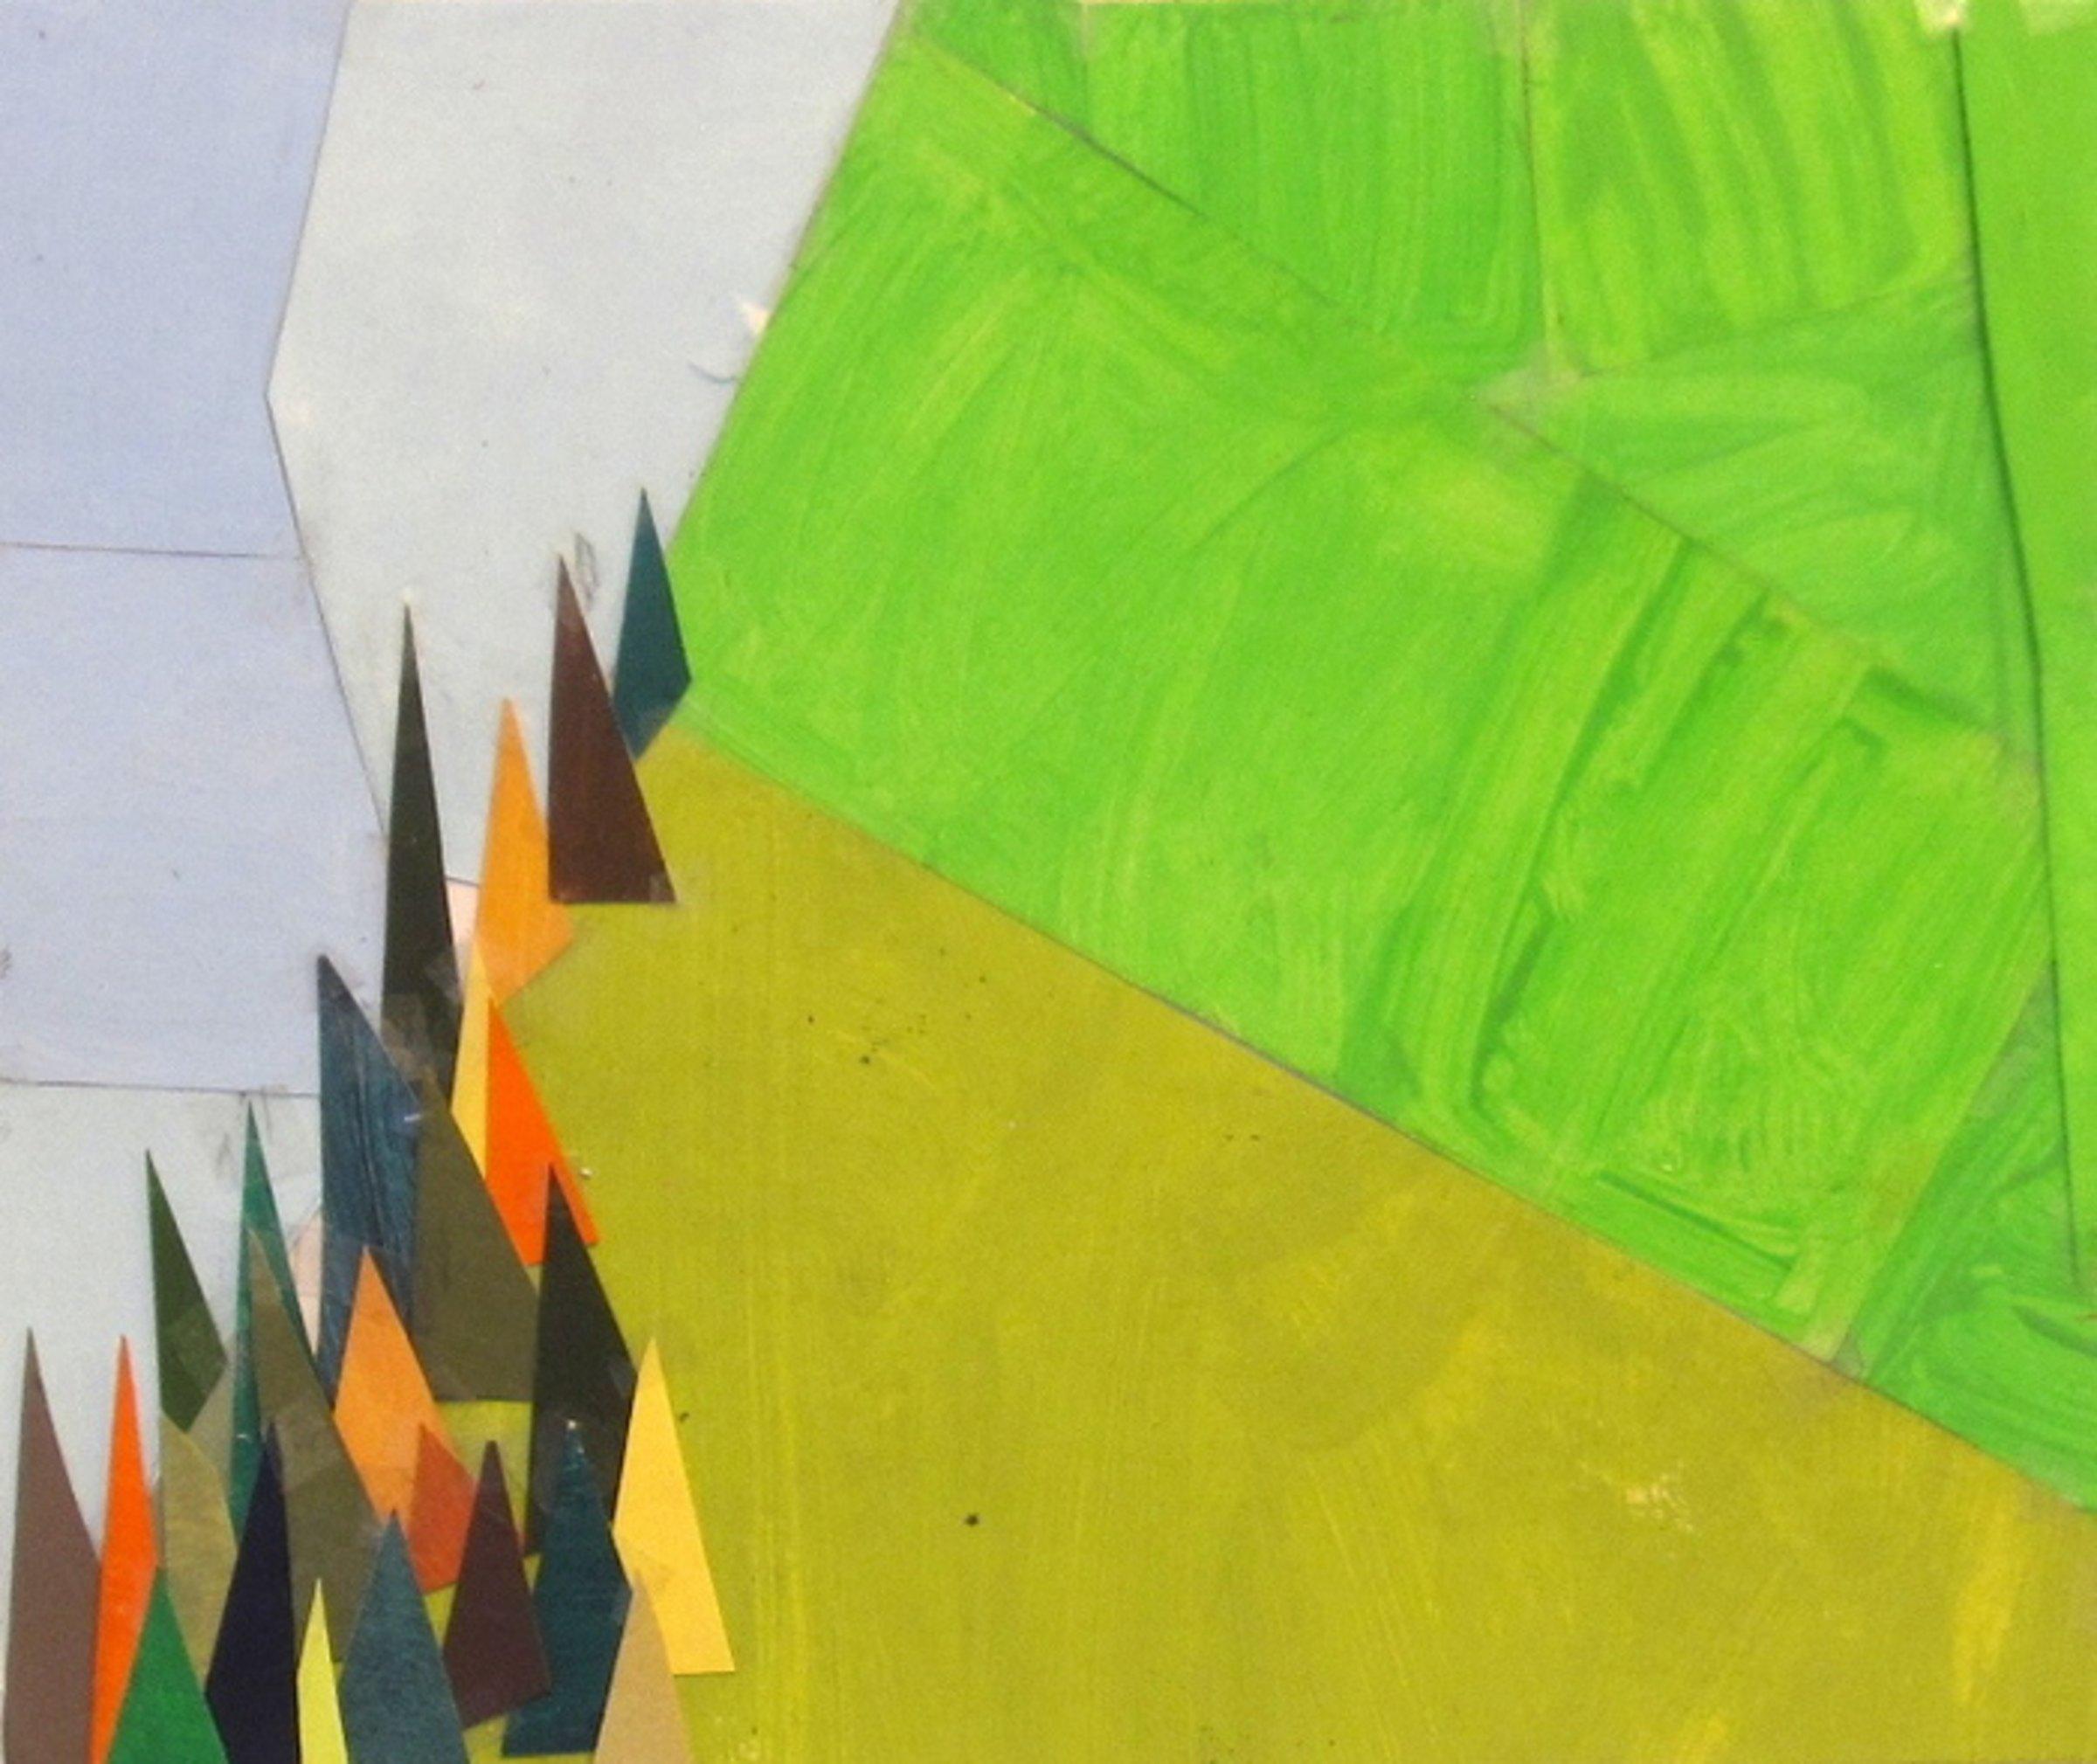 Patty Cateura, Steep Ascent, 2014